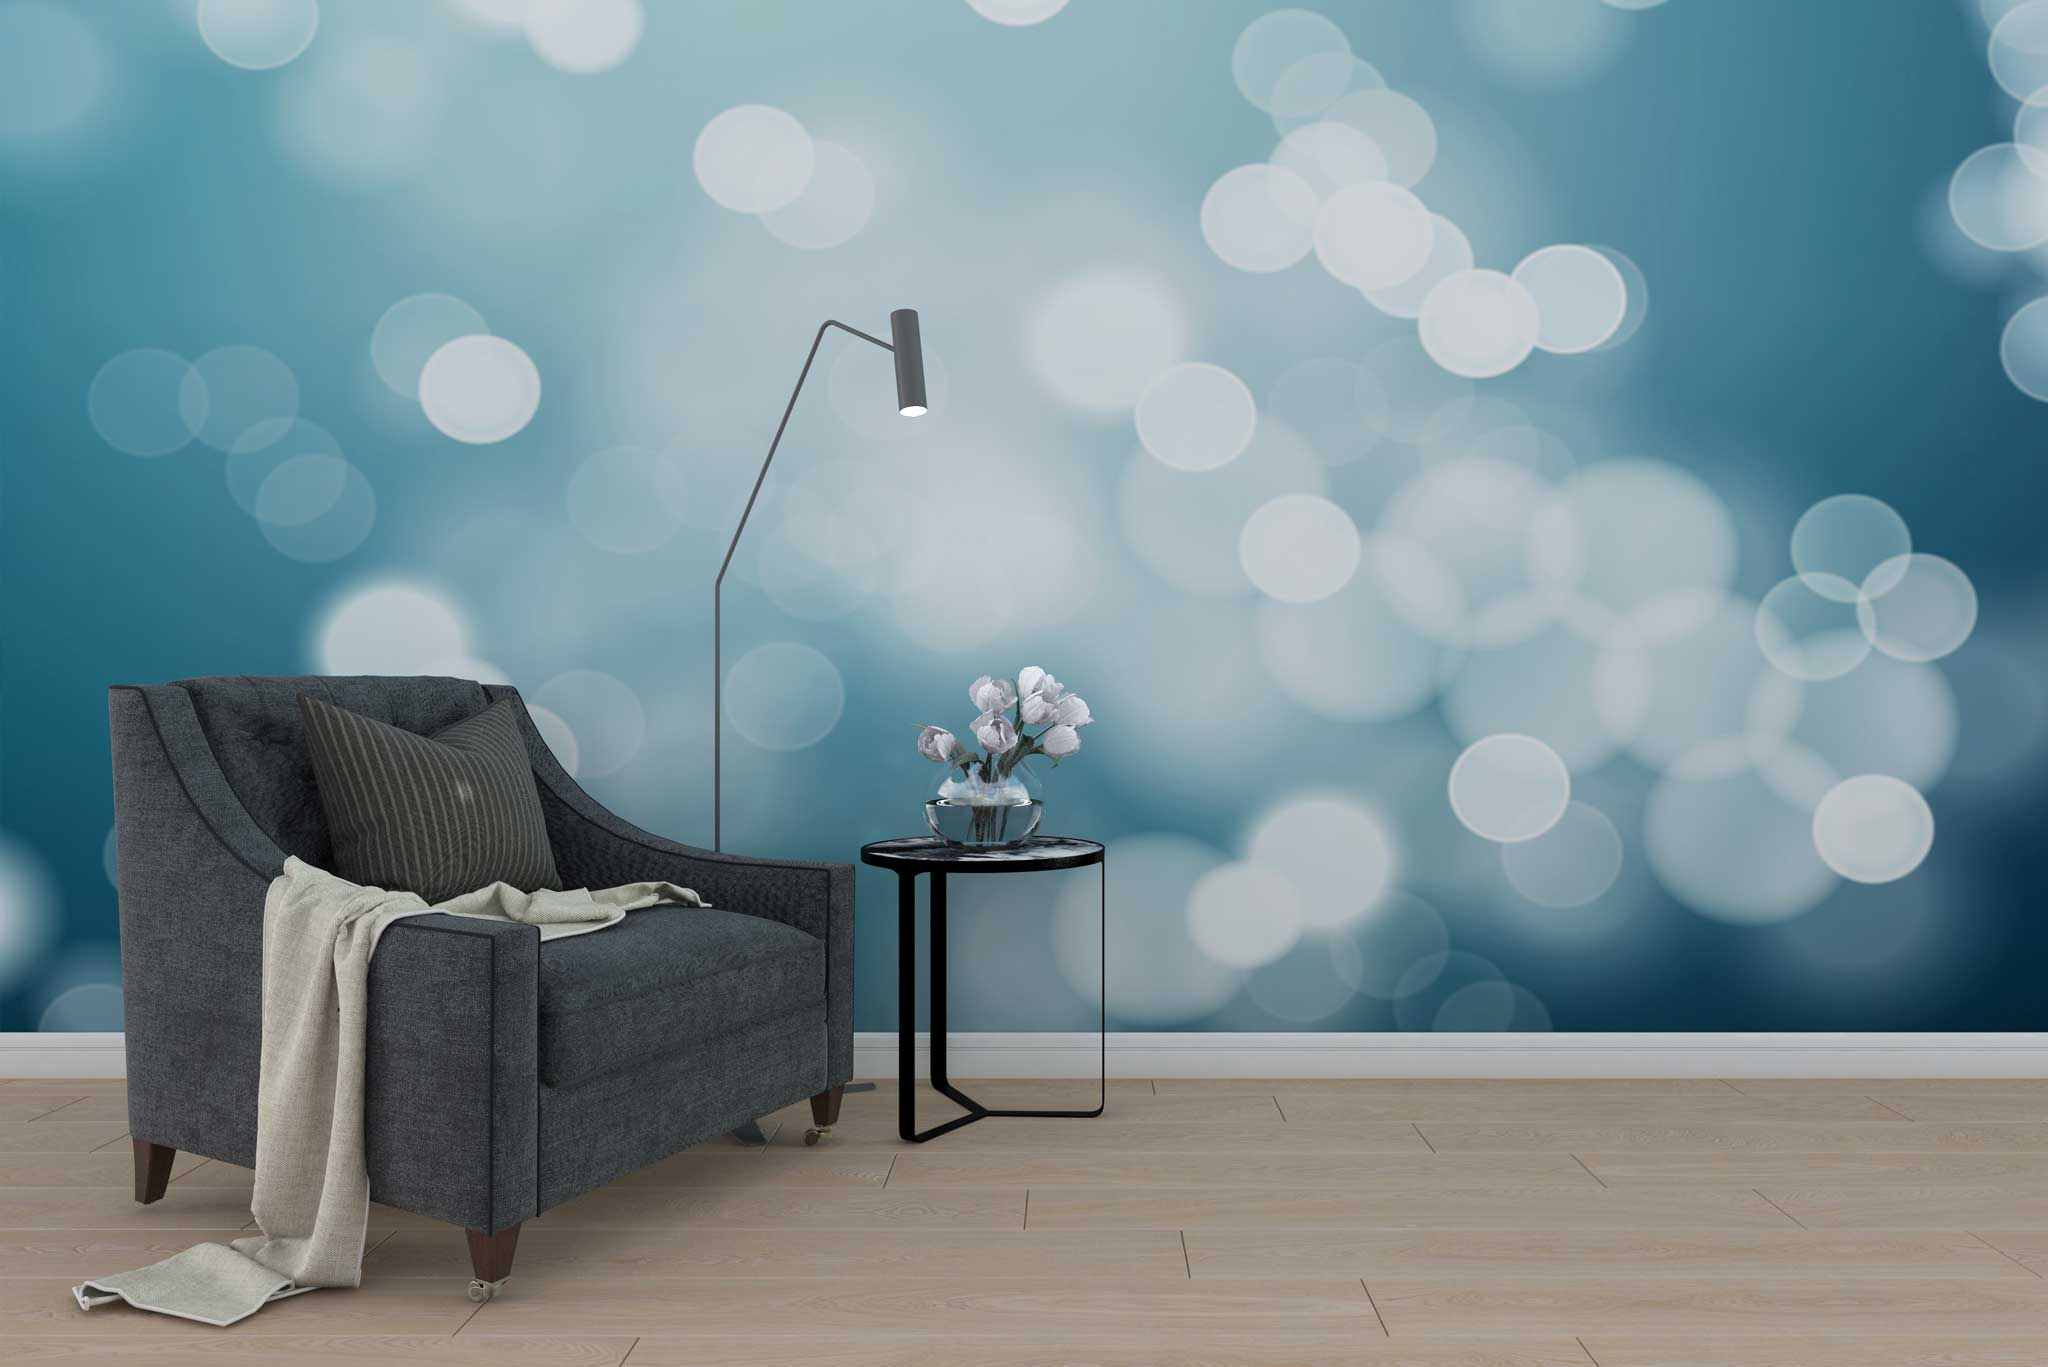 tapet-fototapet-special-personalizat-customizabil-comanda-bucuresti-daring-prints-model-imagine-halou-lumini-grafic-albastru